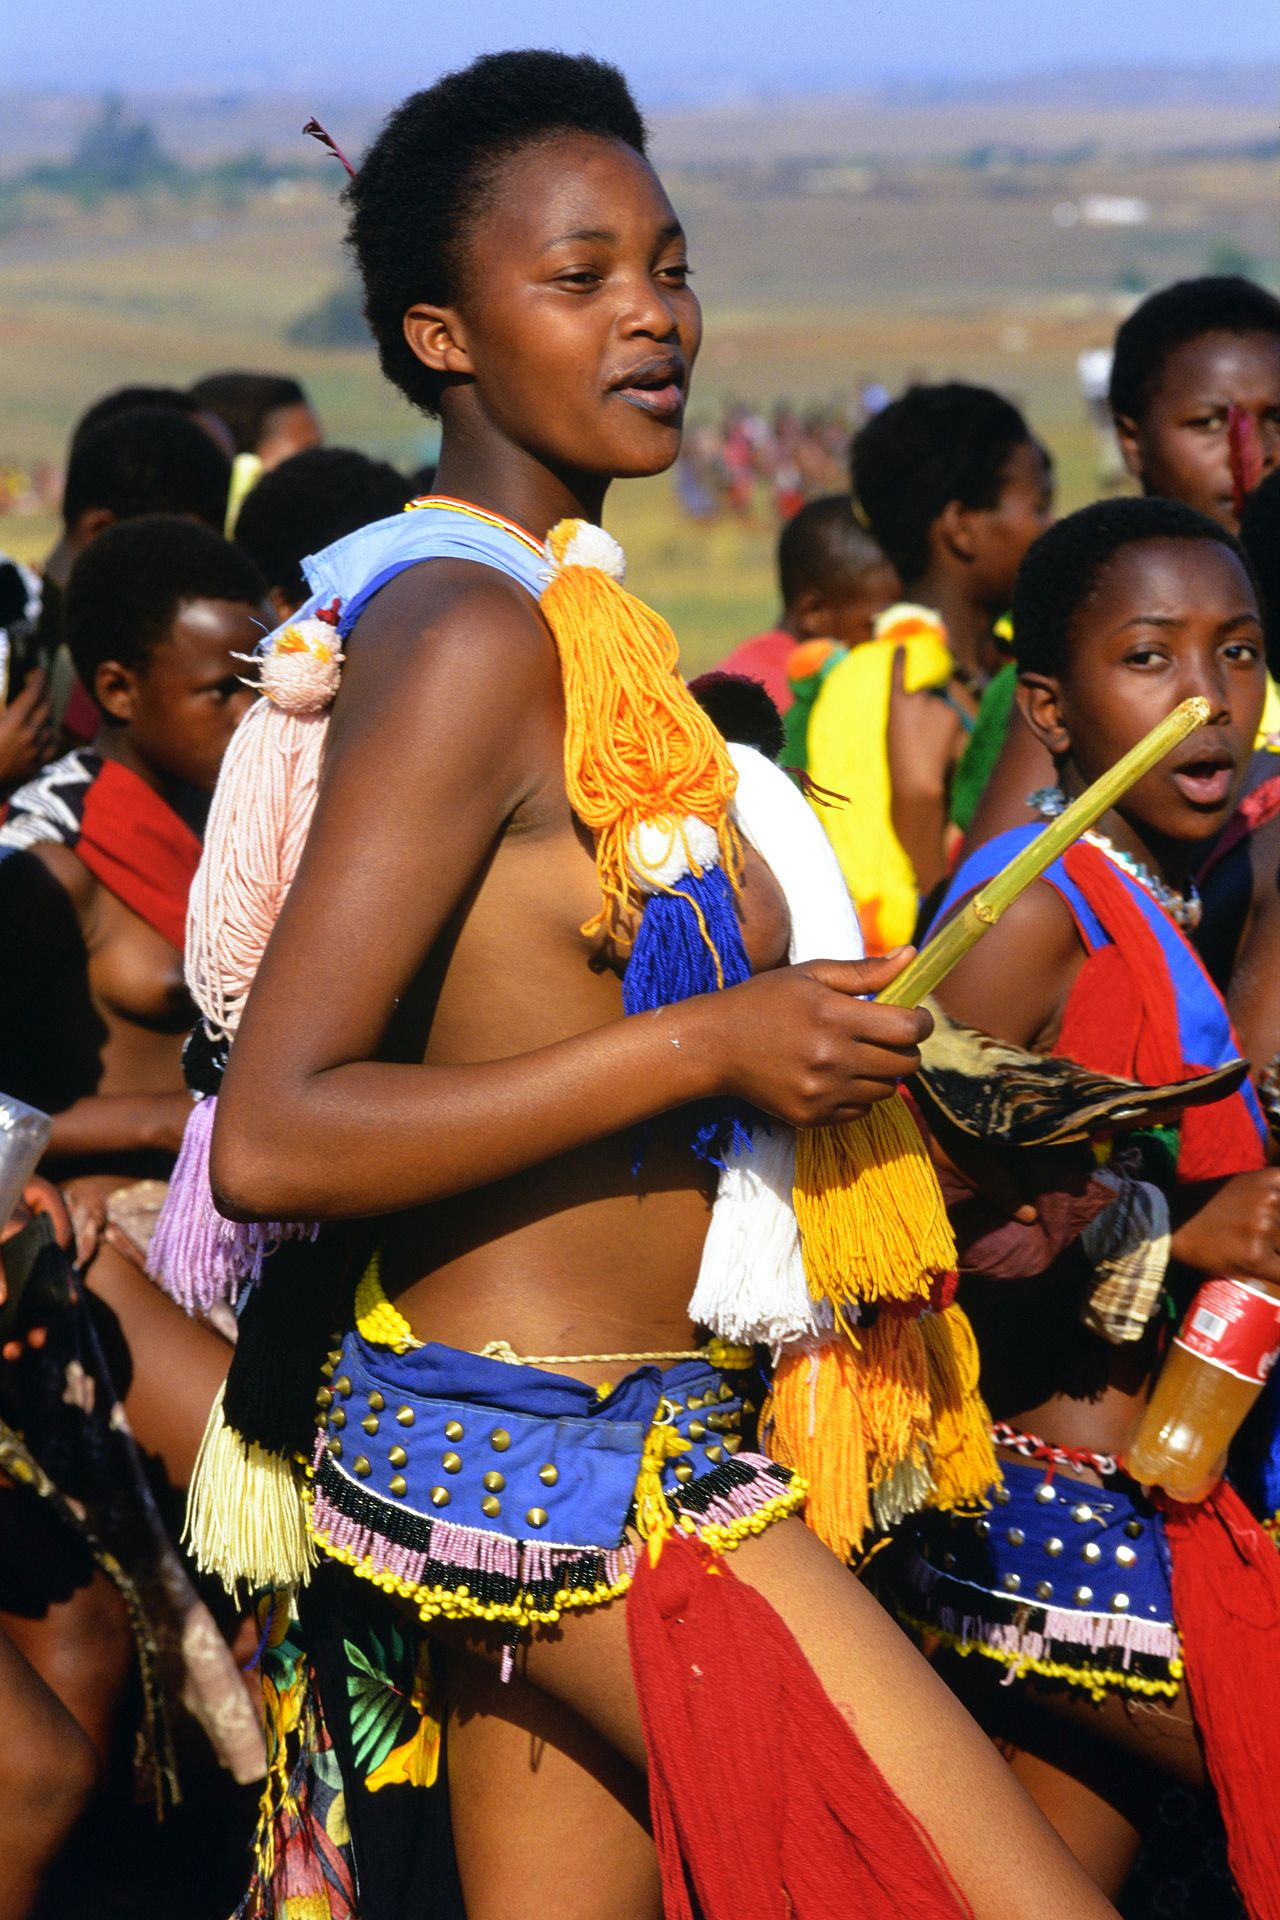 Sense. South african reed dance girls consider